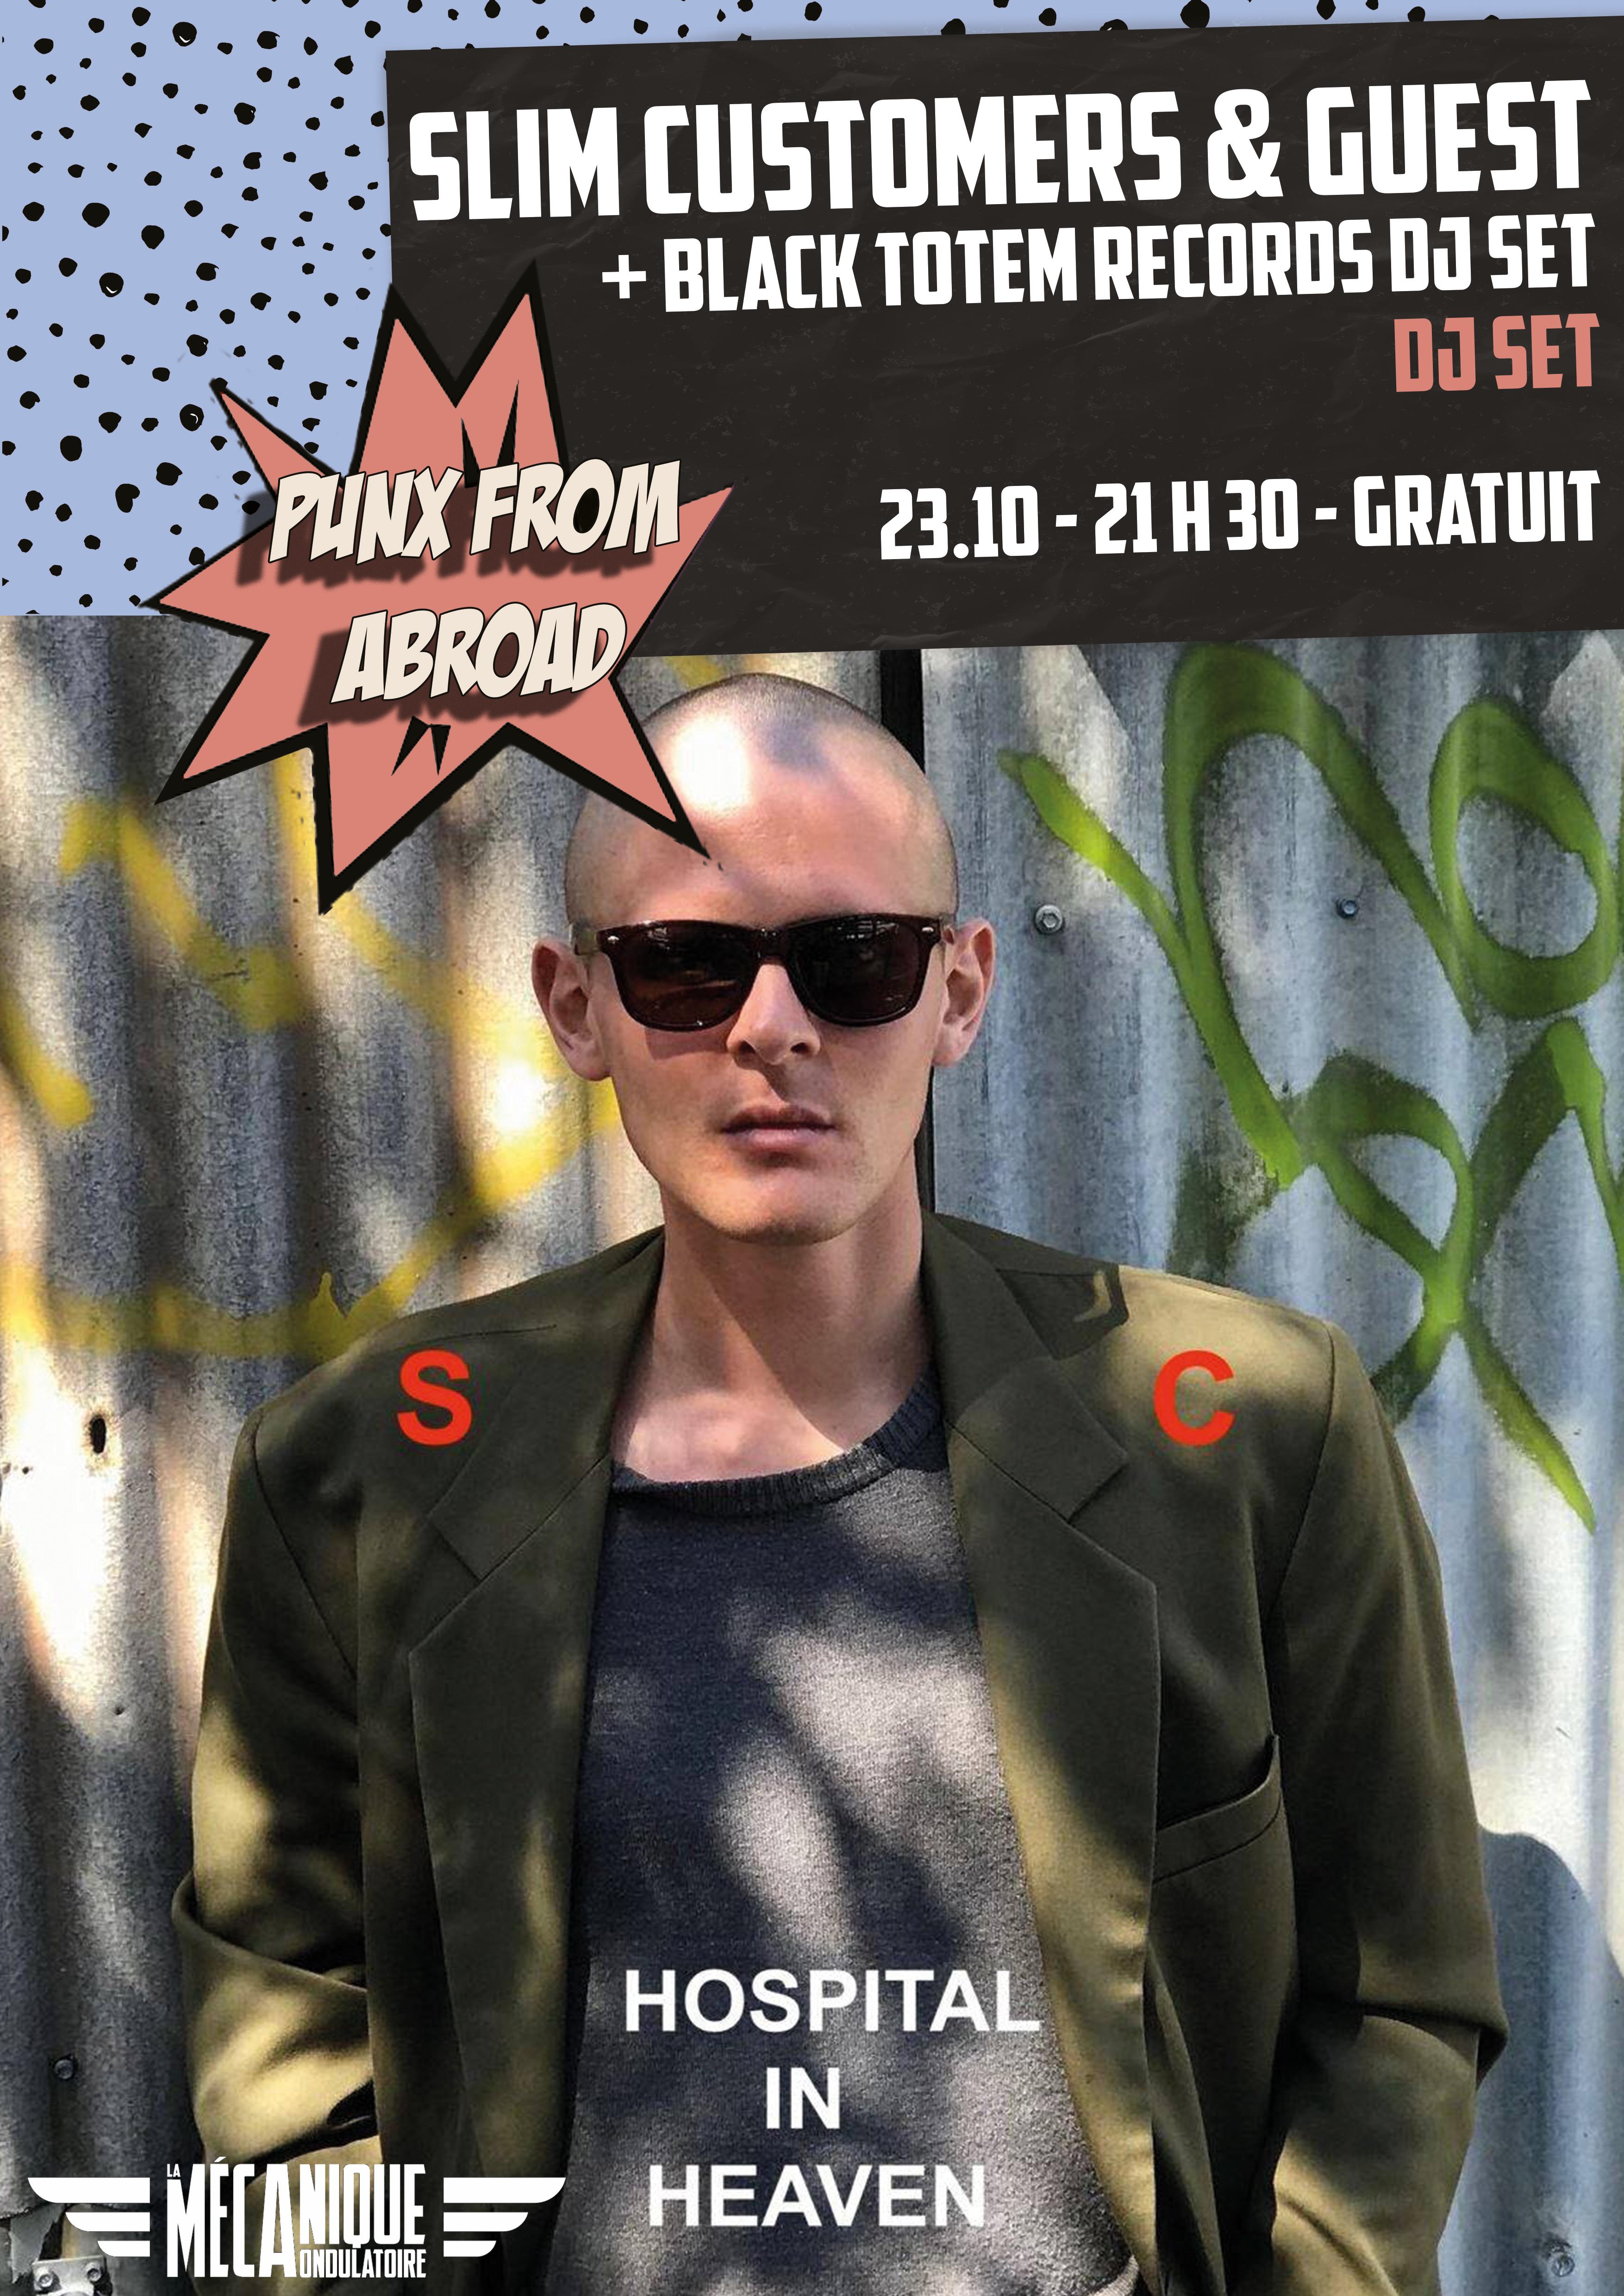 Punx From Abroad : Slim Customers LIVE + Black Totem DJ set // 23.10